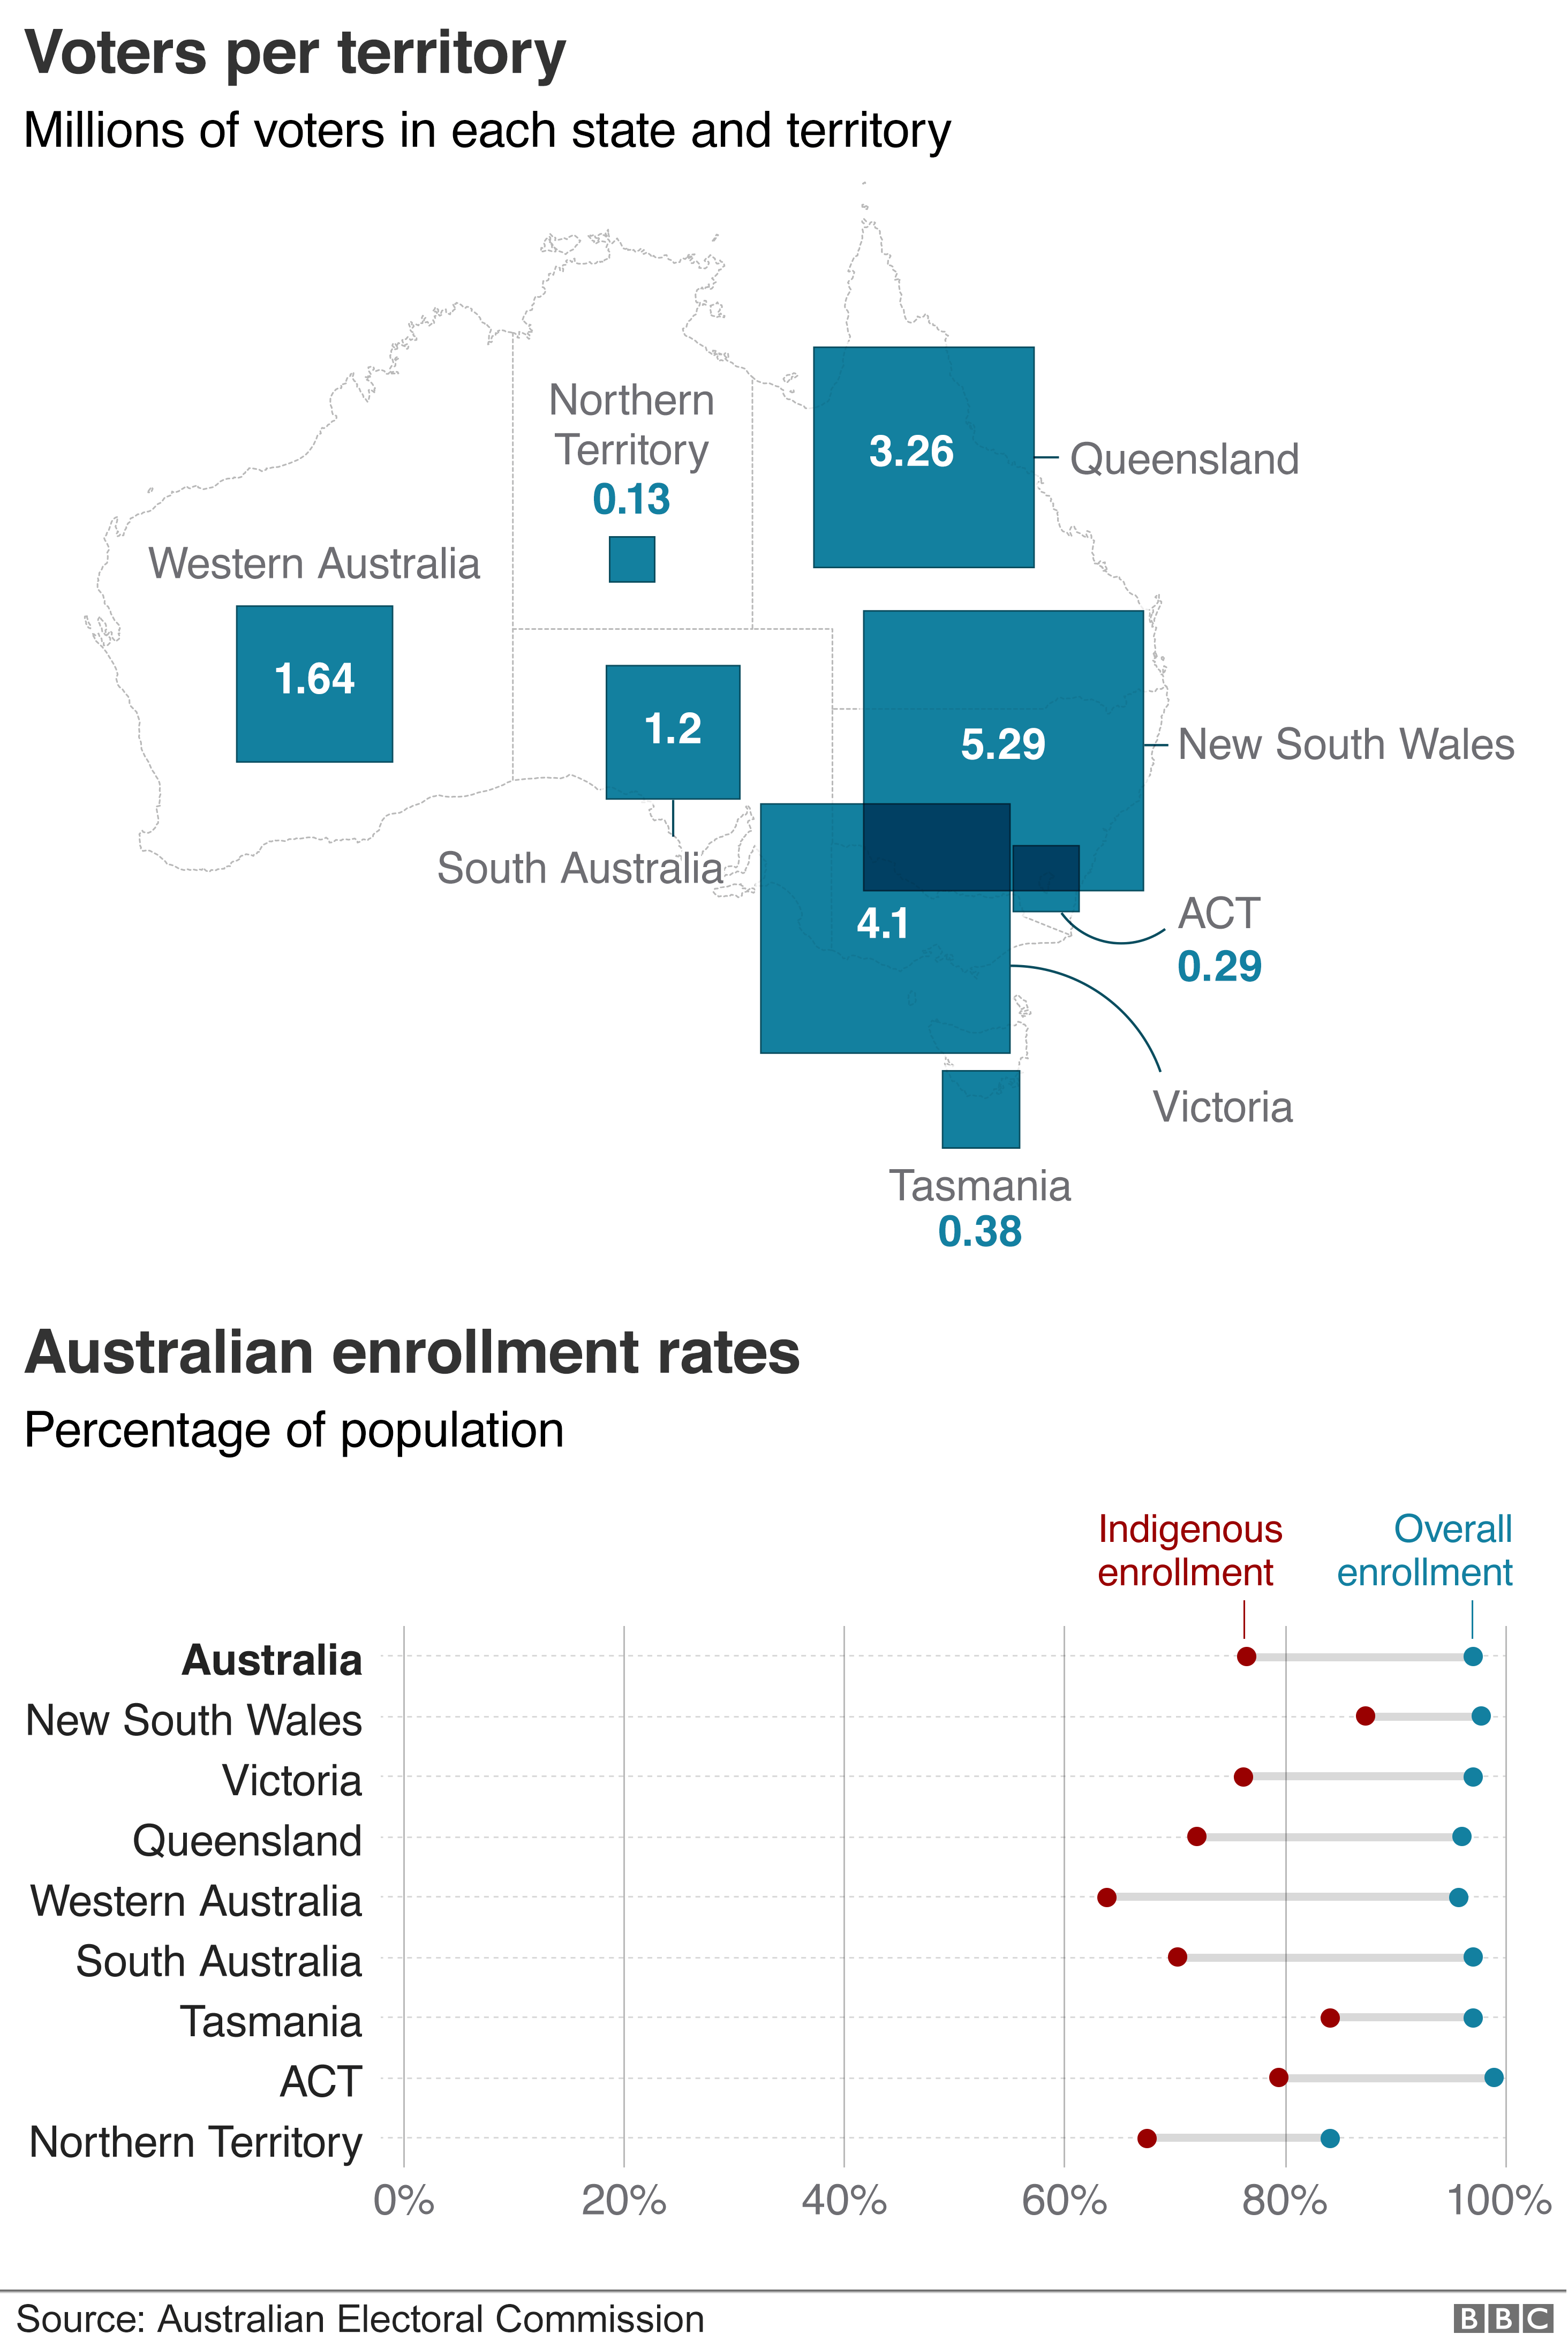 Graphic: Breakdown of voters per territory